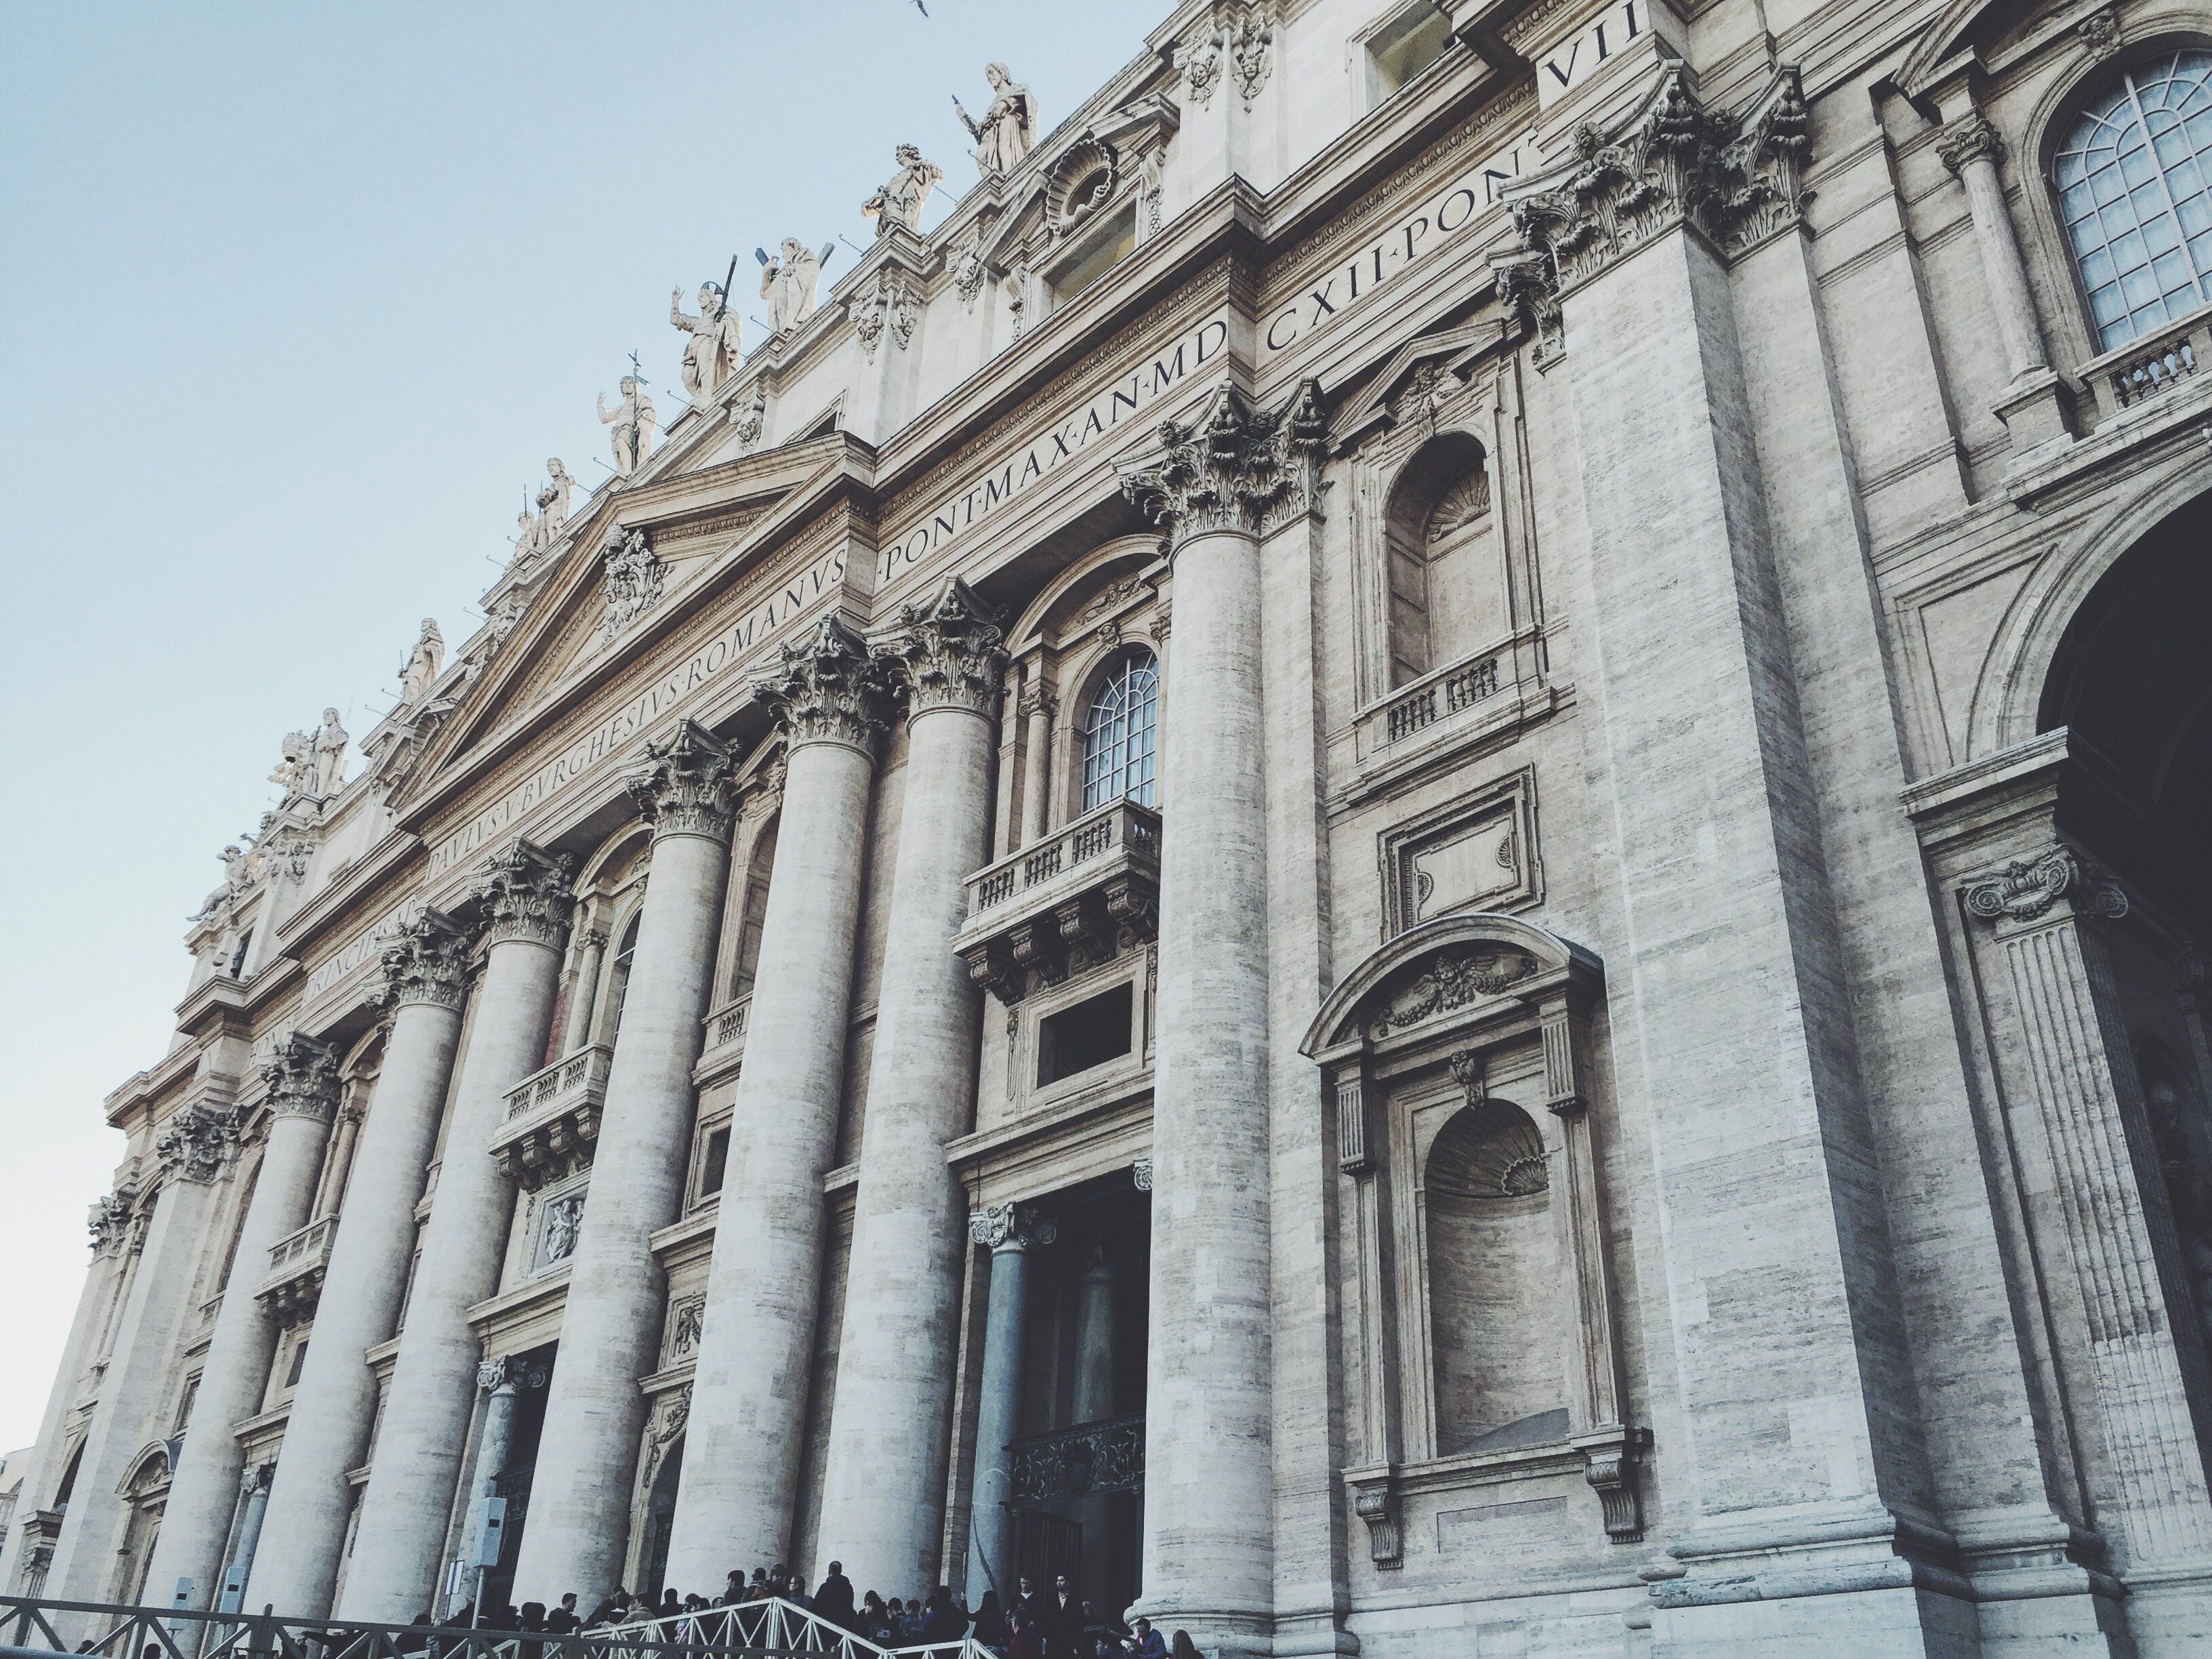 Kostenloses Stock Foto zu architektur, basilika, gebäude, monument